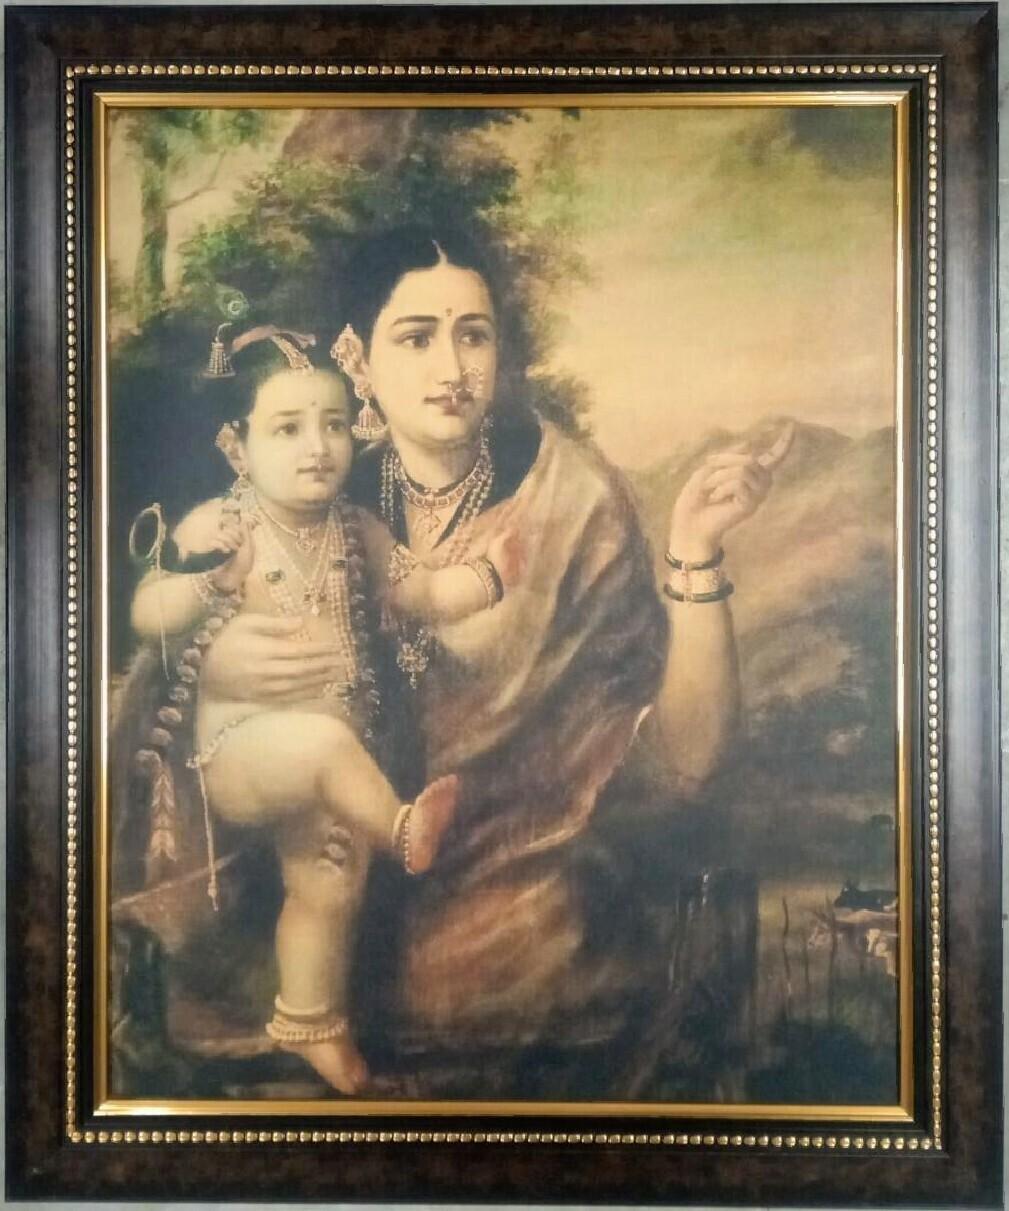 Lord Sri Krishna and Yashoda Picture (Raja Ravi Varma Art Copy Printed) with Frame